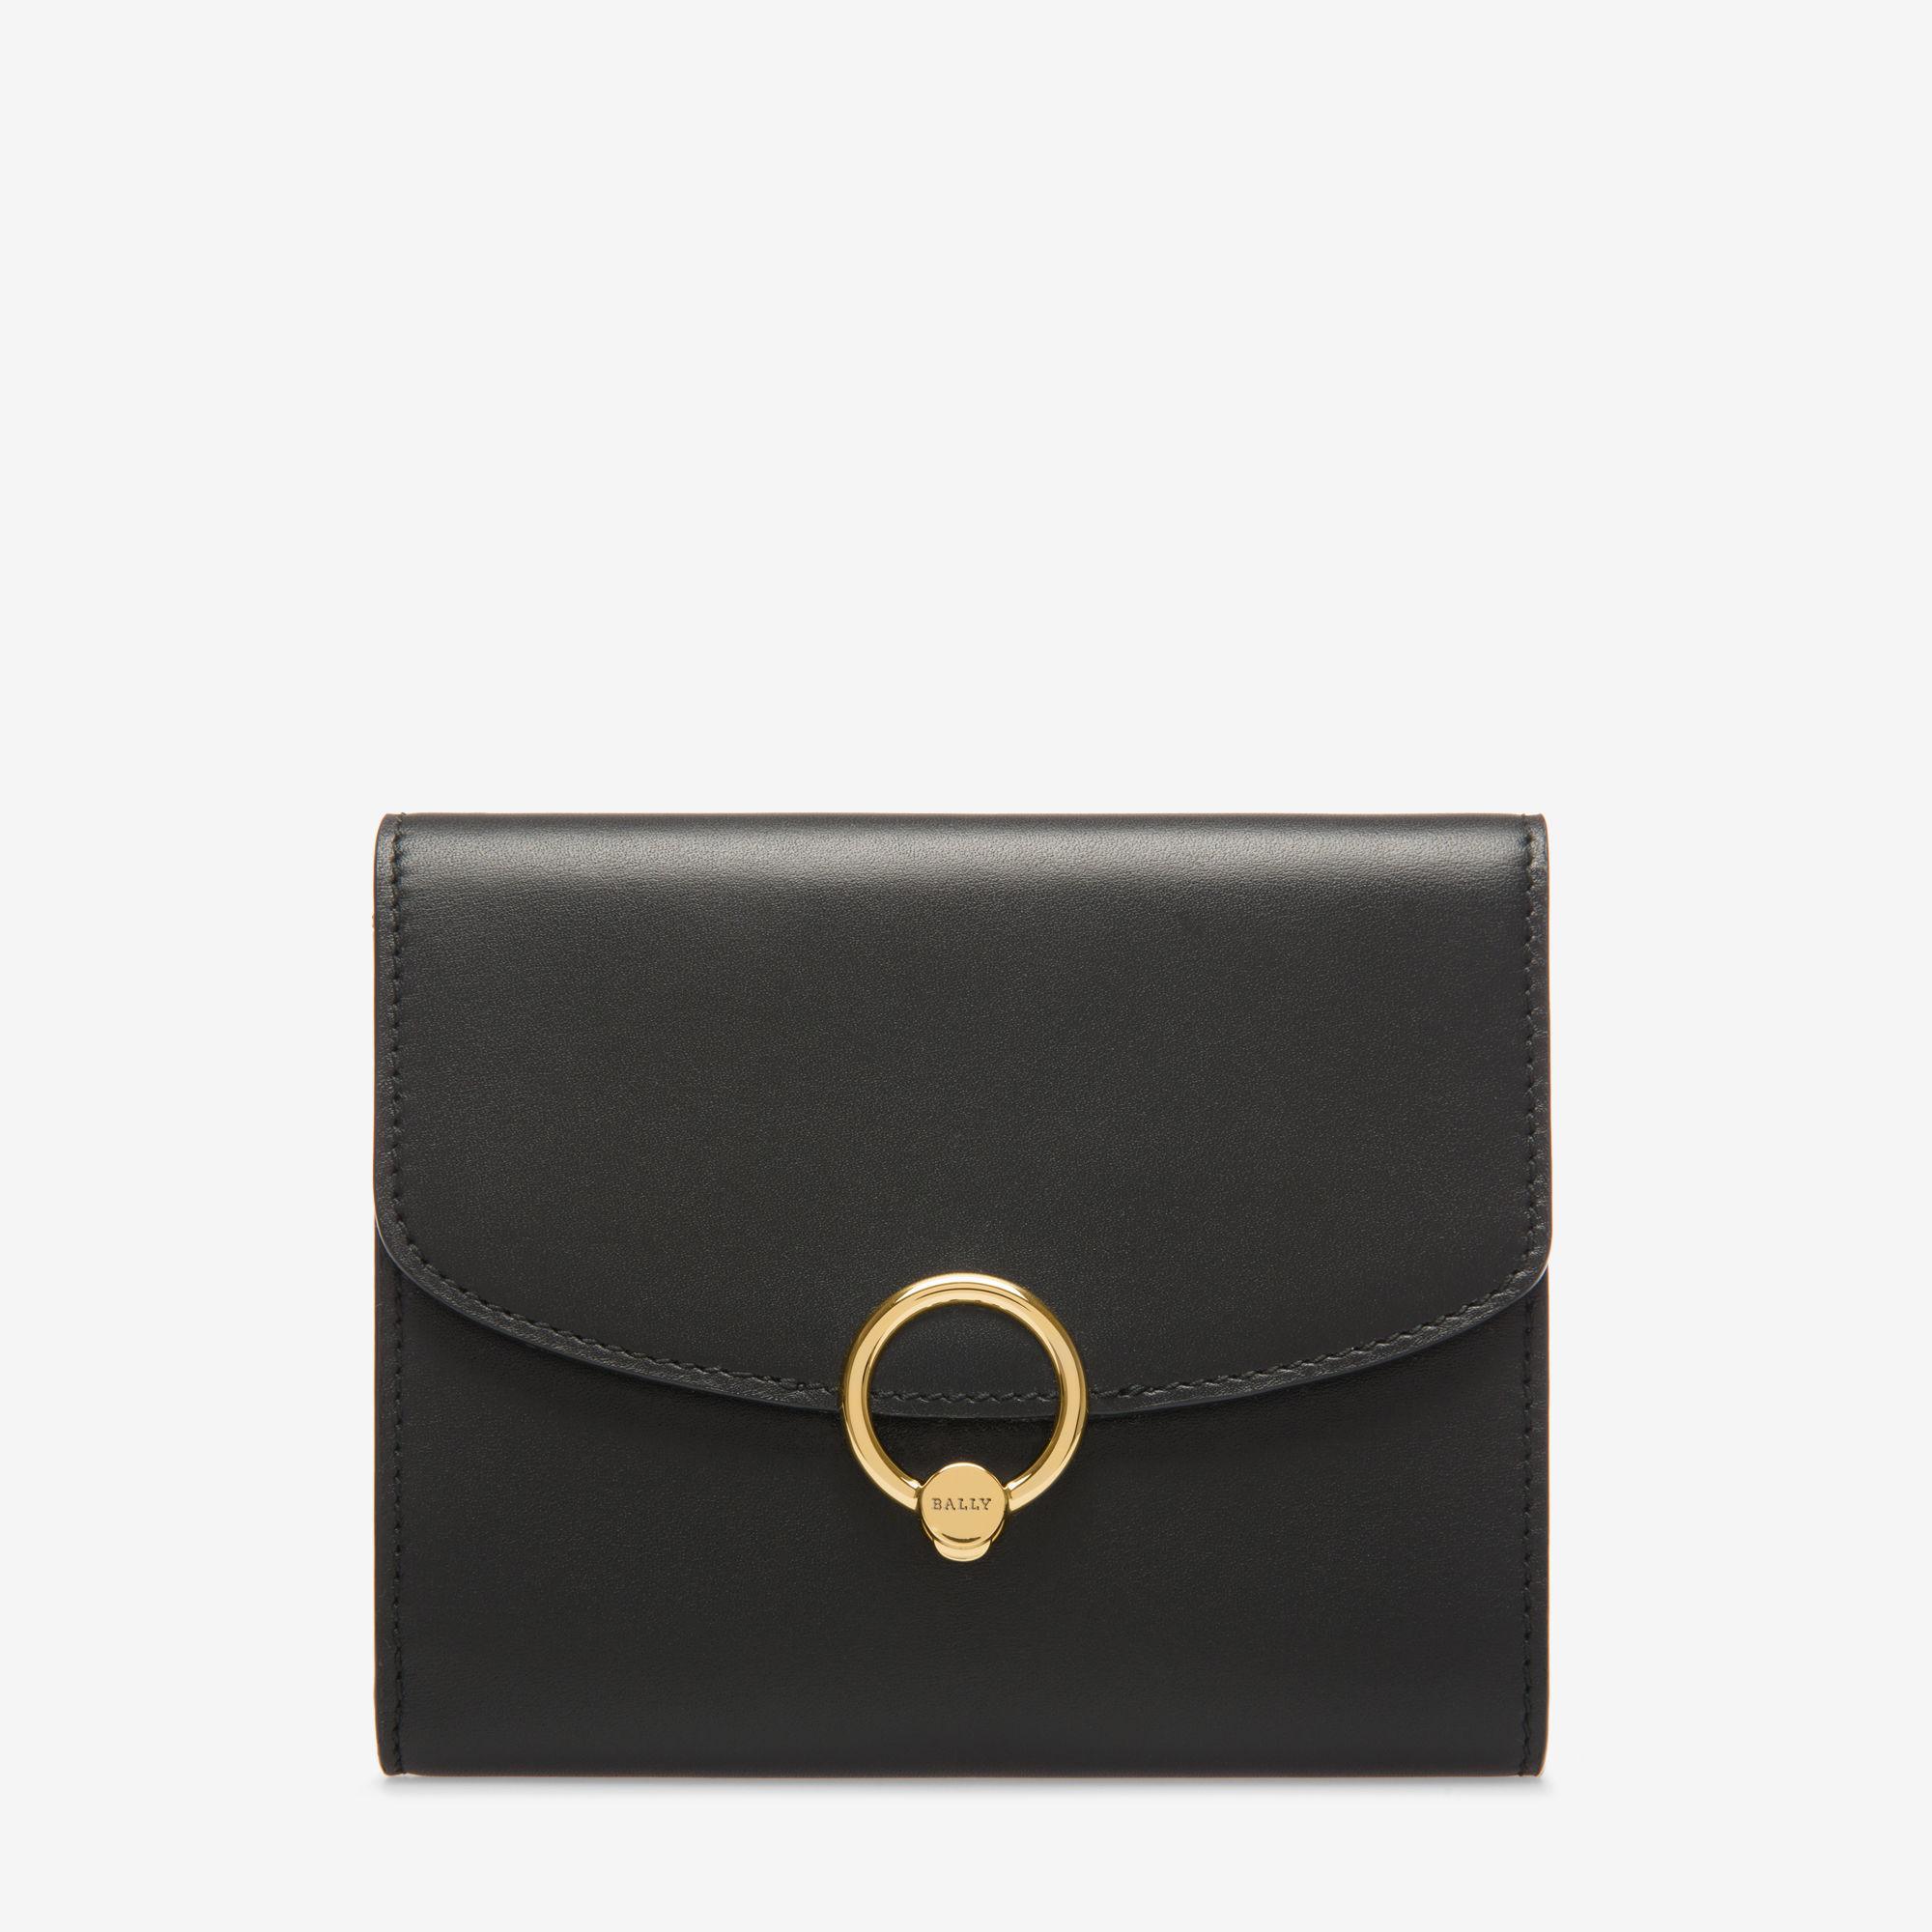 Salen Black, Womens embossed calf leather zip around wallet in black Bally